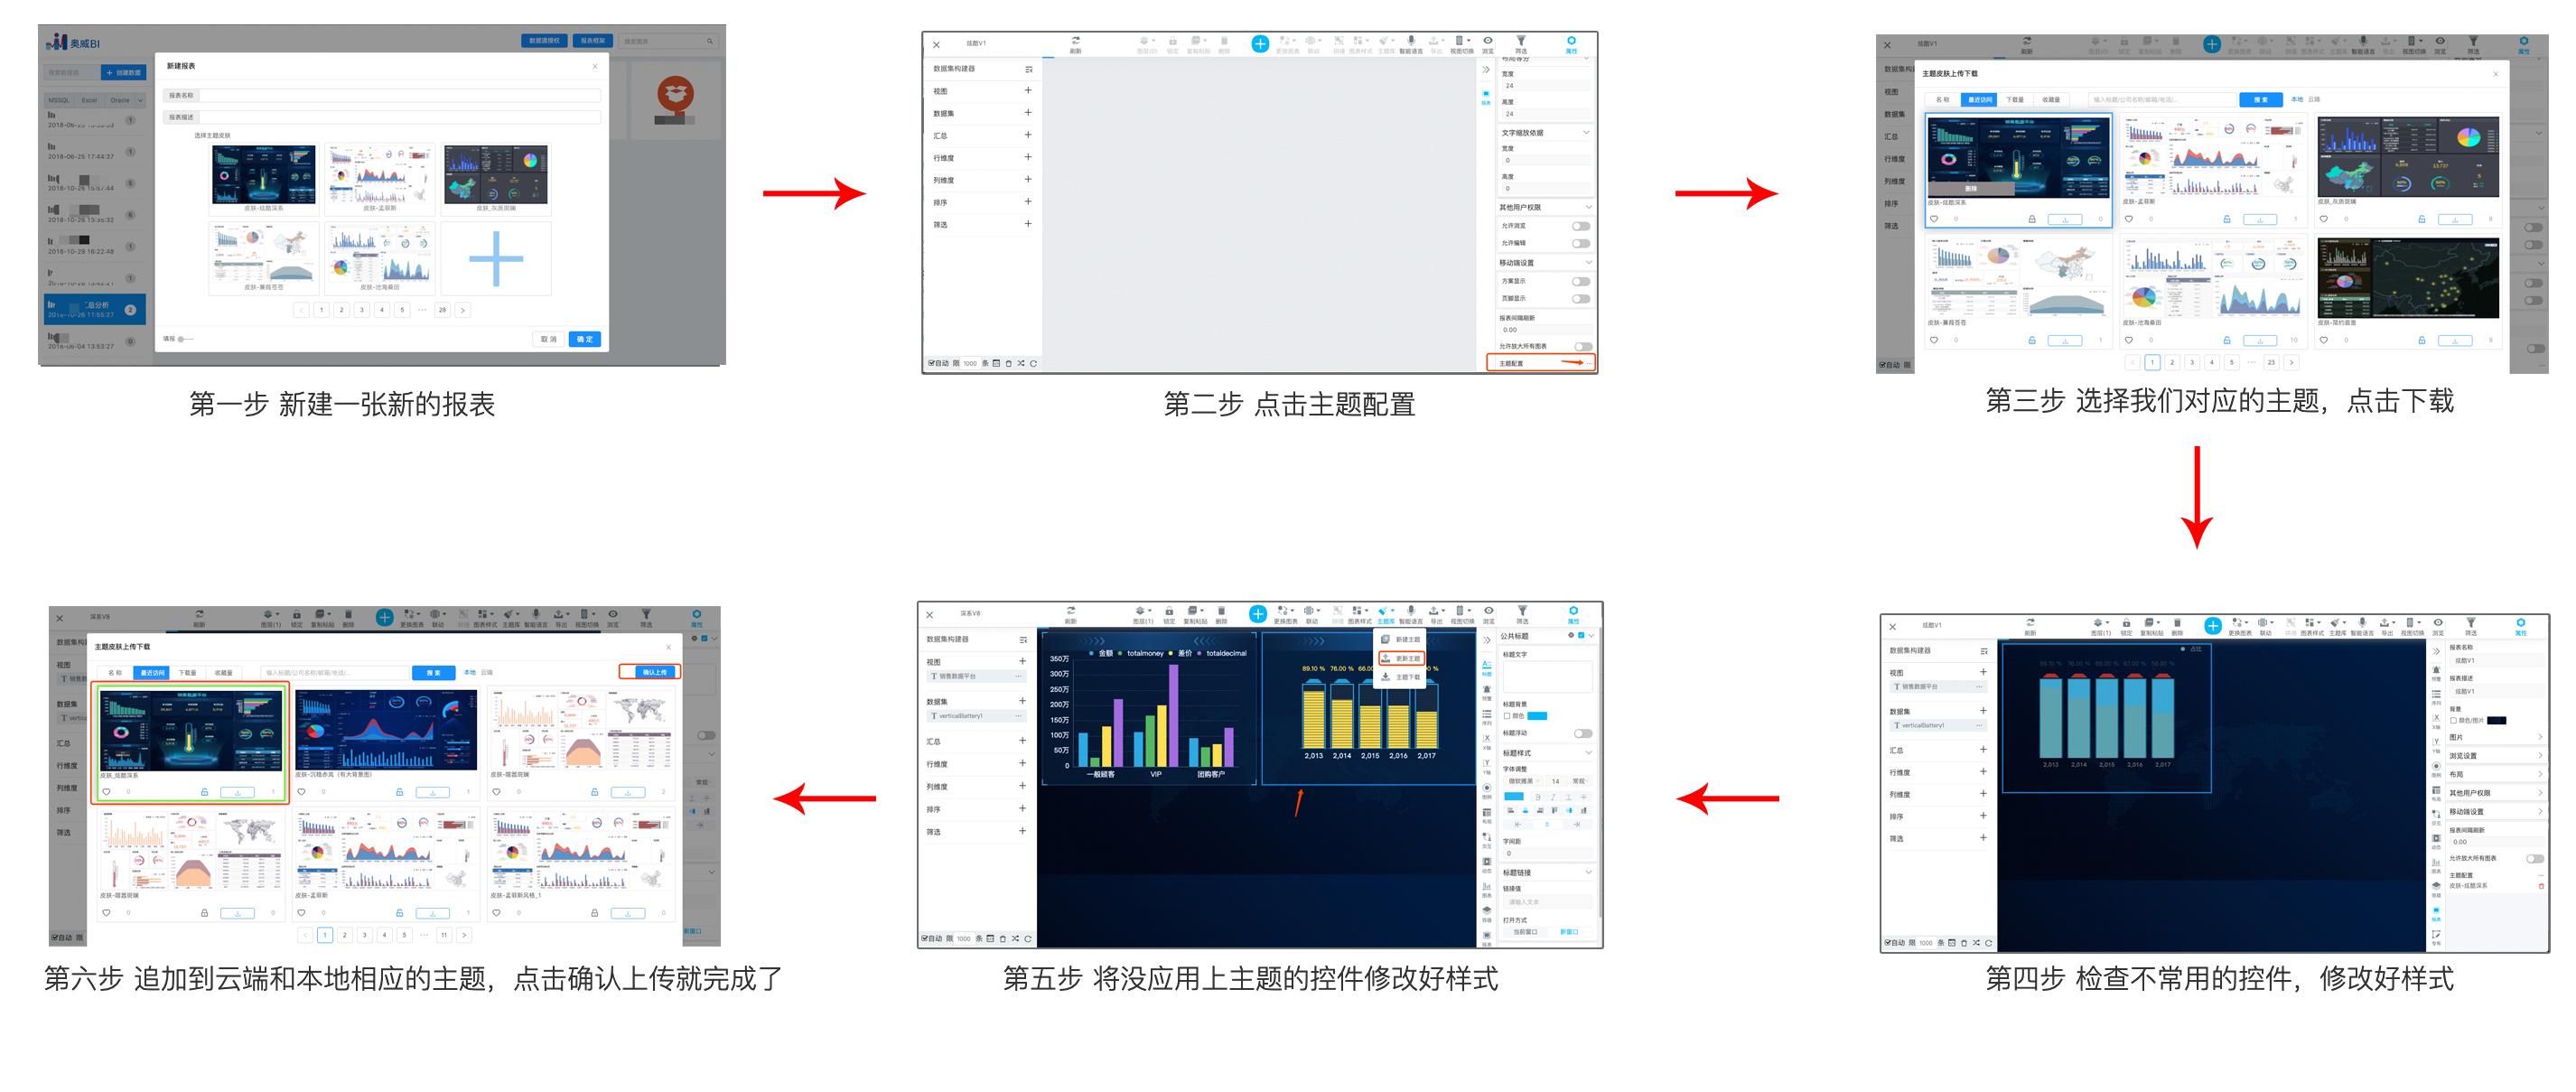 BI数据可视化